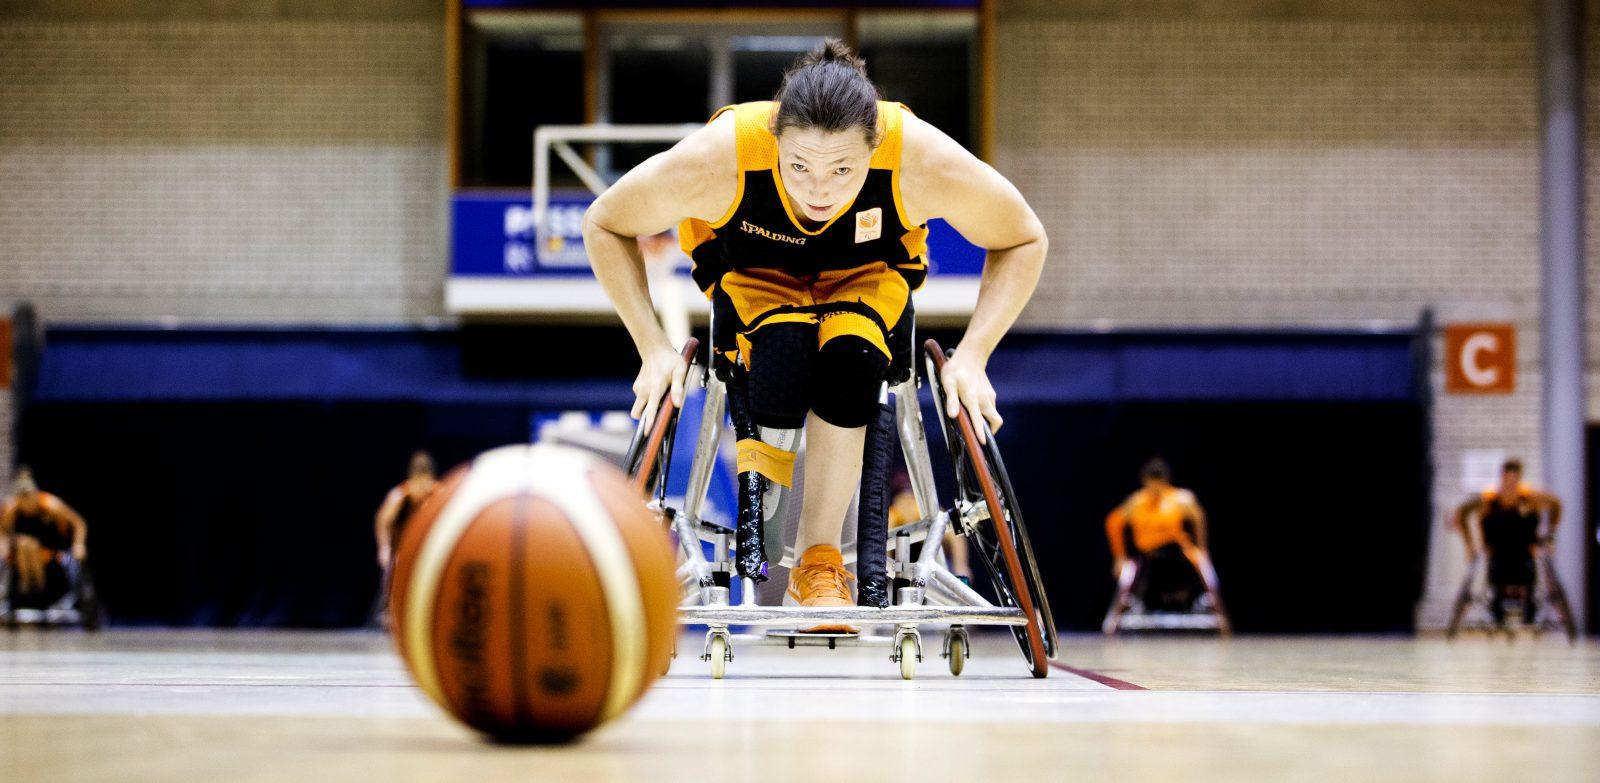 ROTTERDAM - TU Delft Sports Engineering Institute test bewegings sensors op rolstoelen van team Nederland Basketbal. - FOTO GUUS SCHOONEWILLE